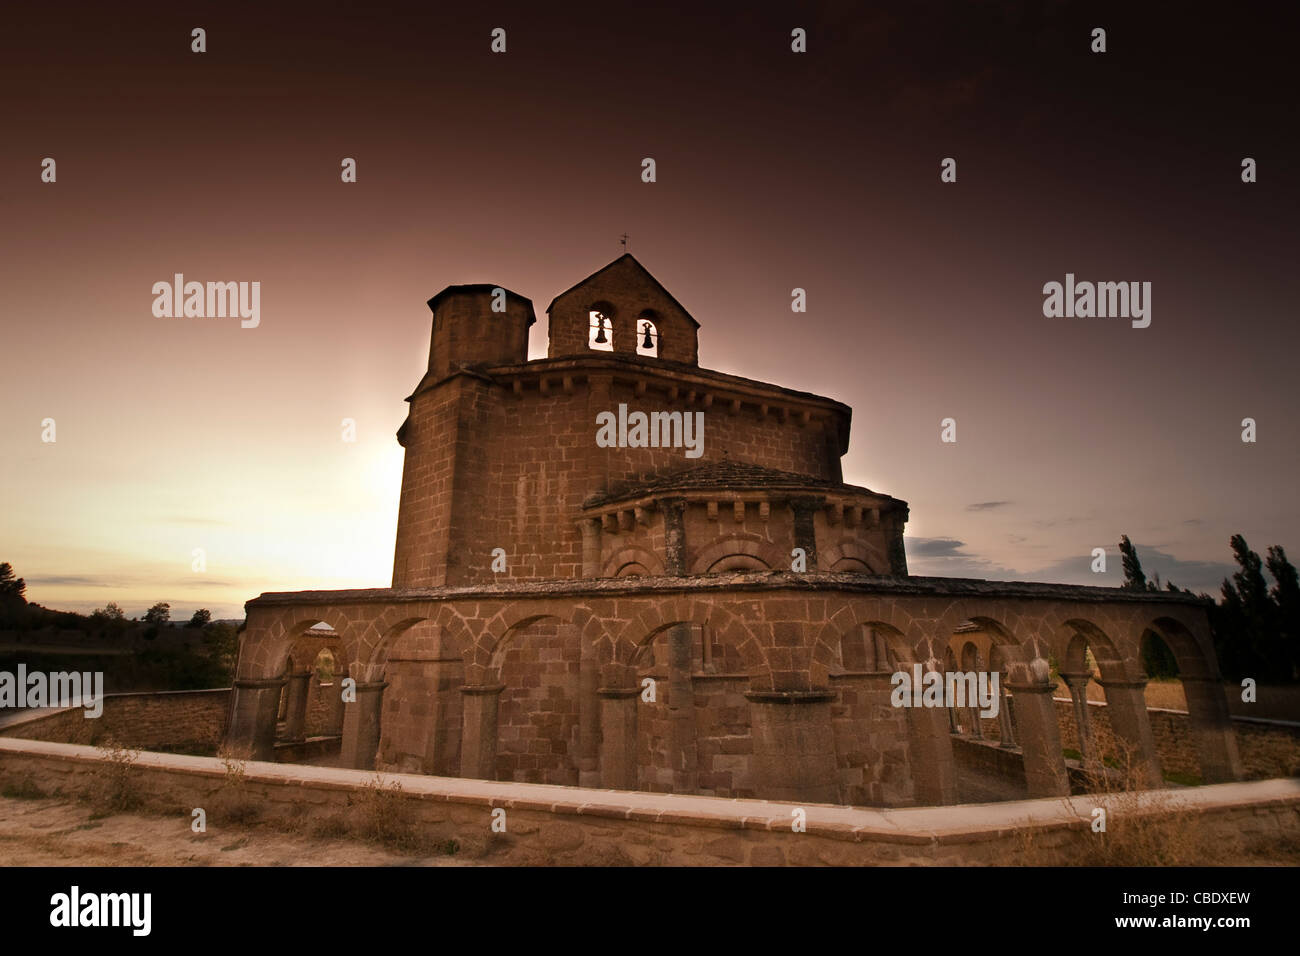 Romanesque church of Santa Maria de Eunate, 12th century, Road of Santiago, Kingdom of Navarre, Spain, Europe. - Stock Image